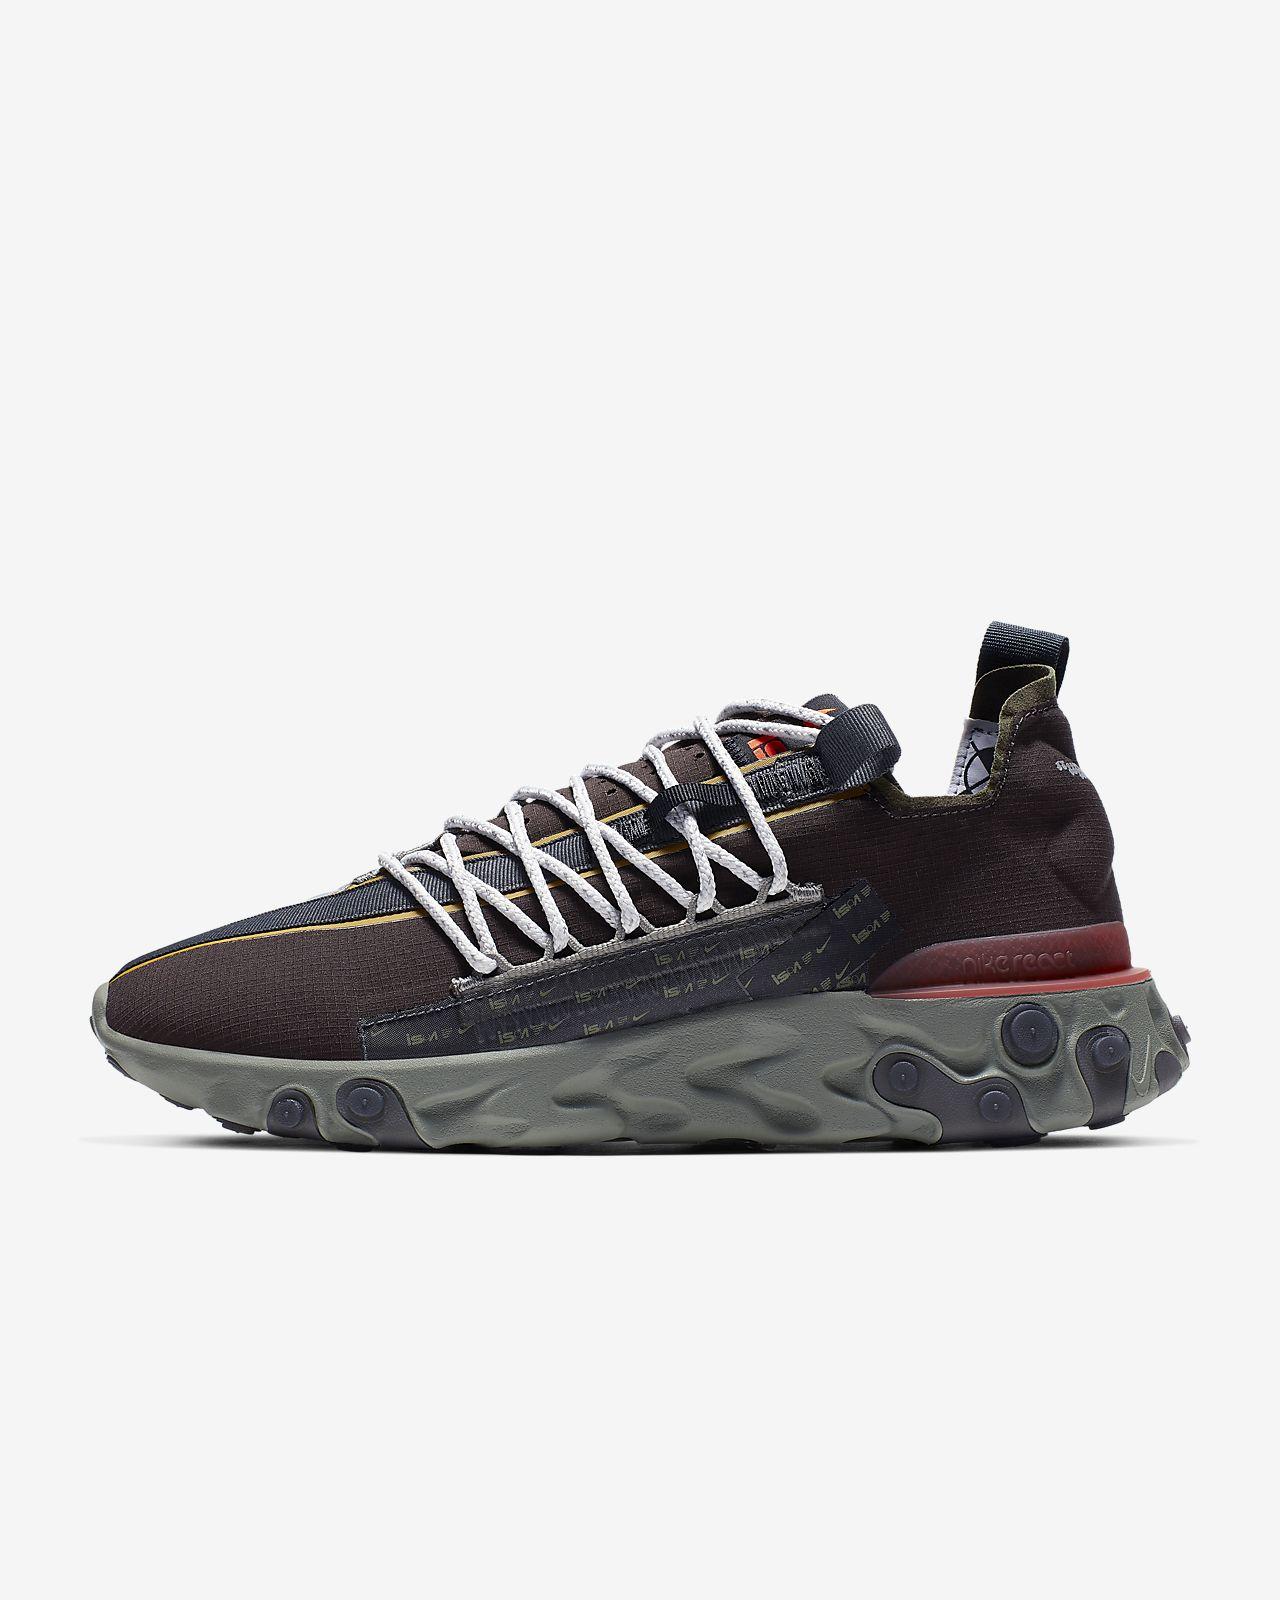 Scarpa Nike ISPA React WR - Uomo